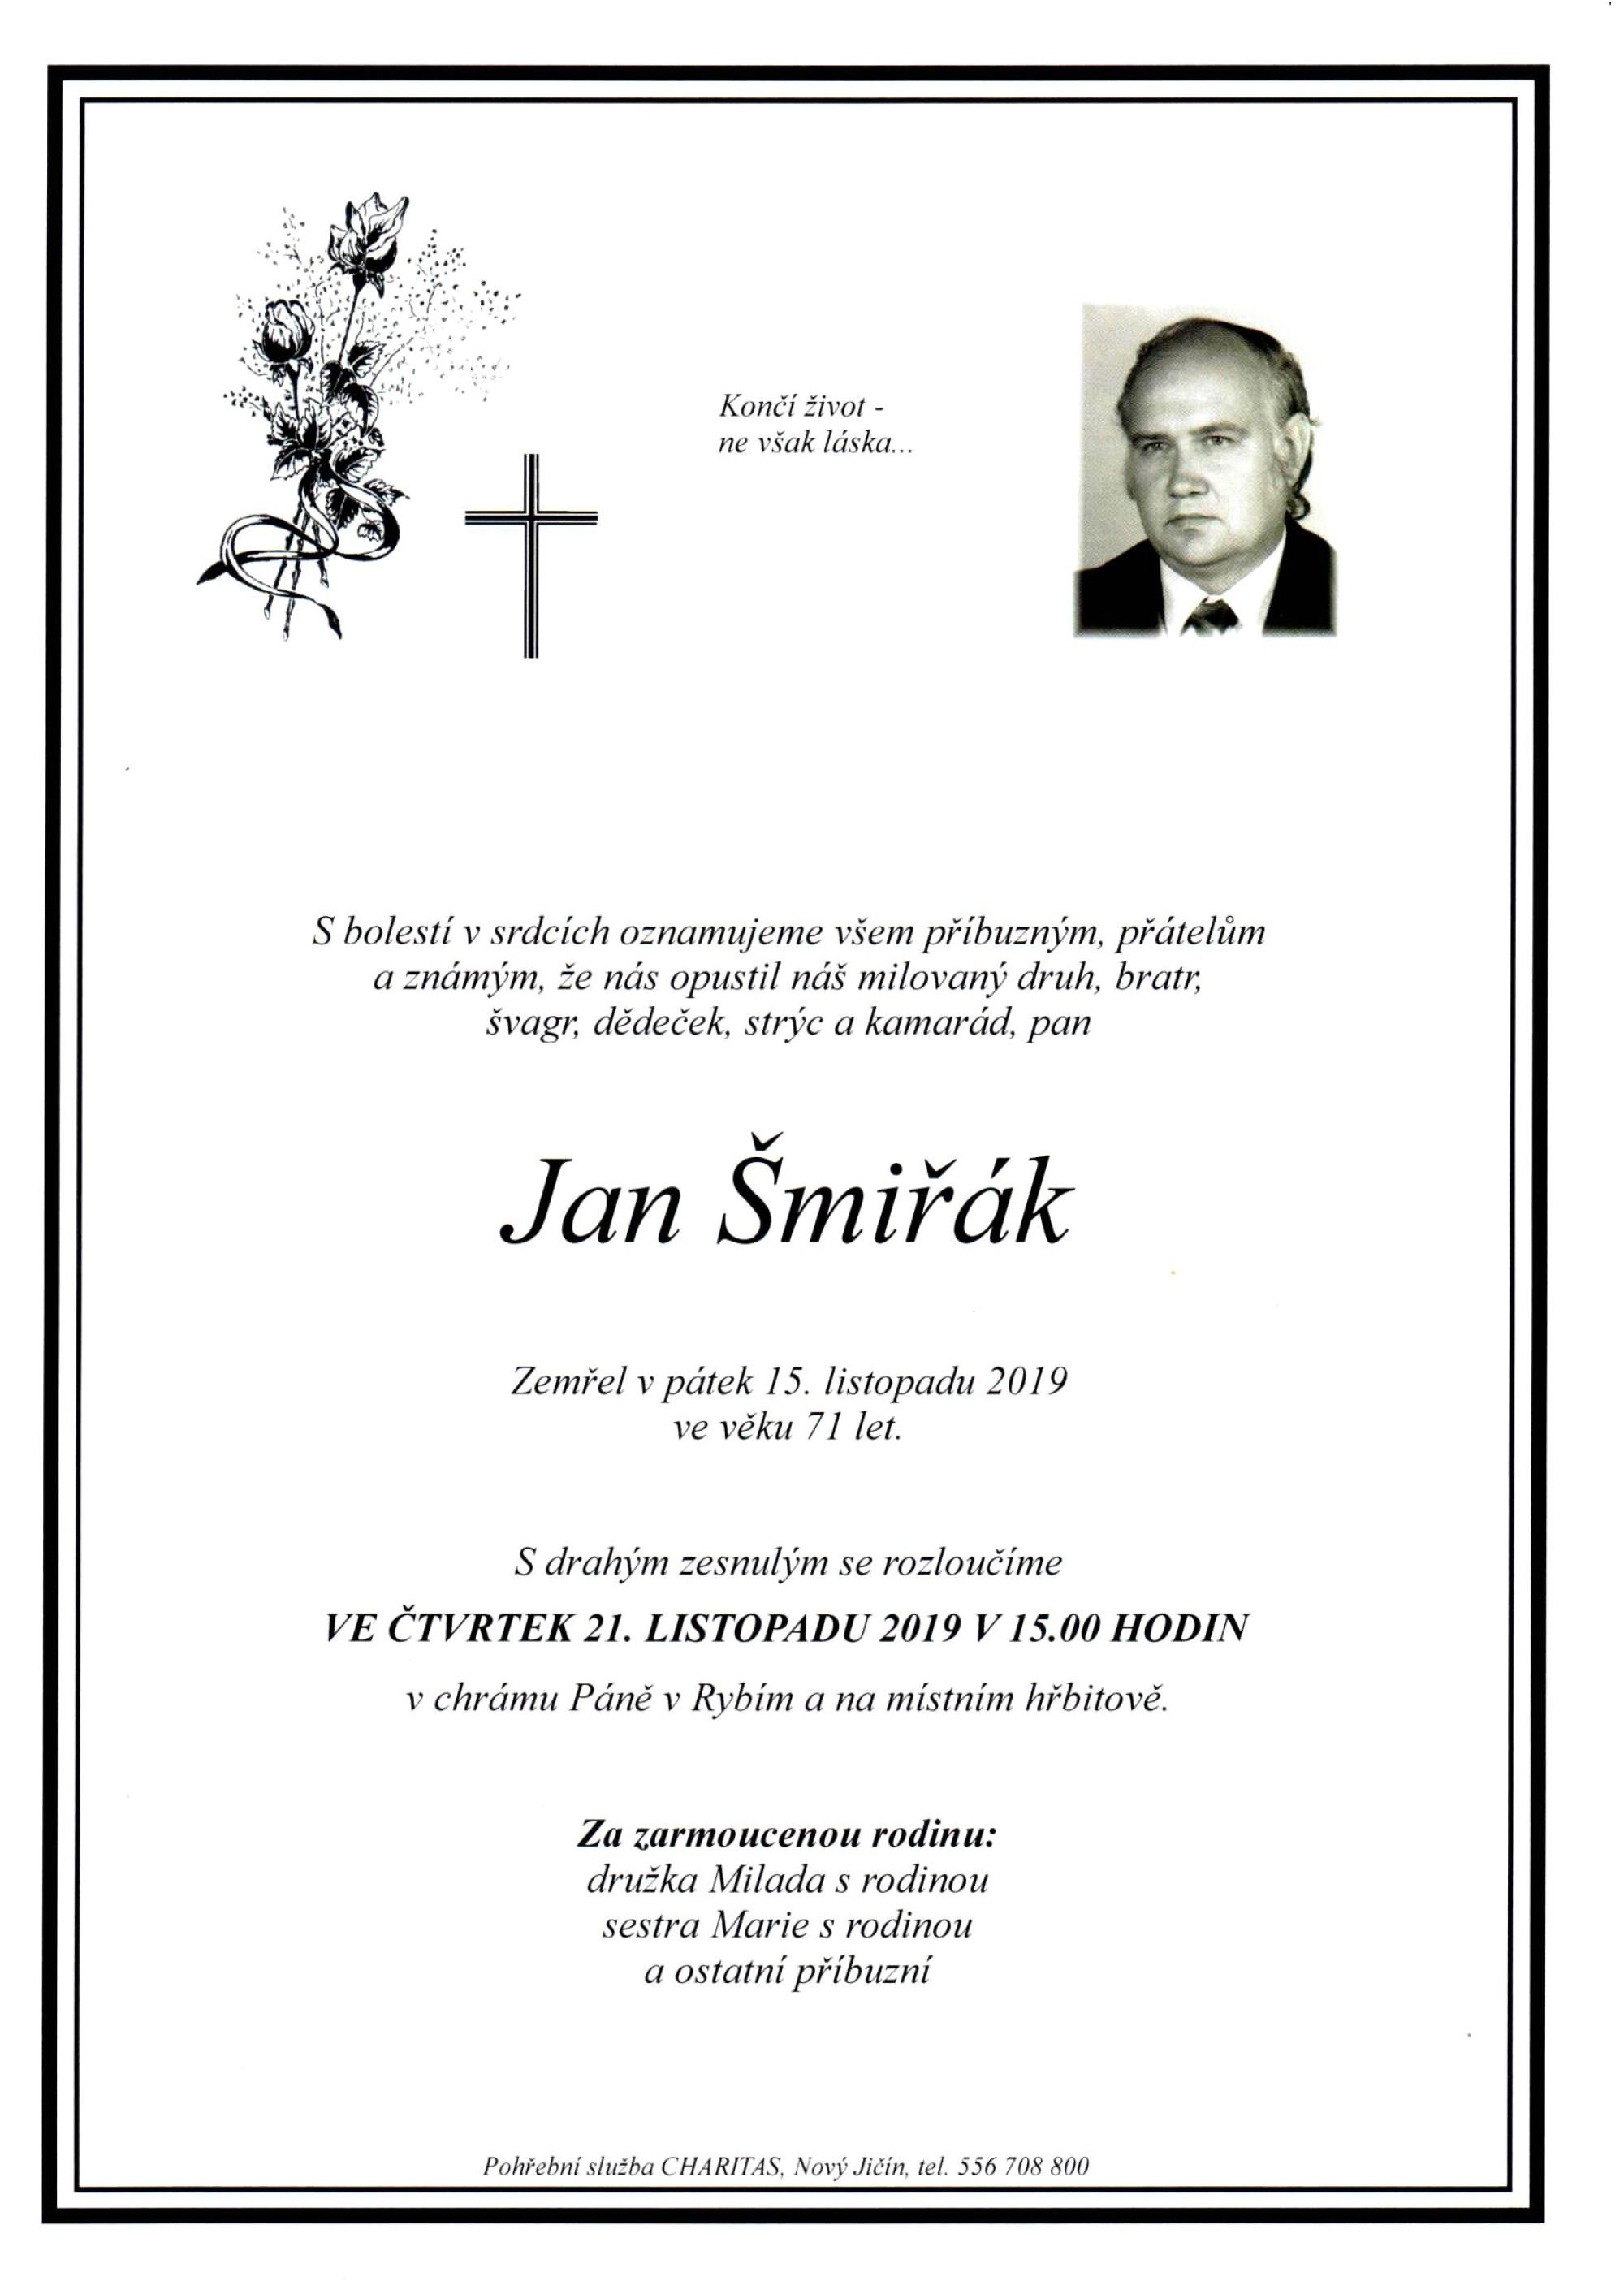 Jan Šmiřák